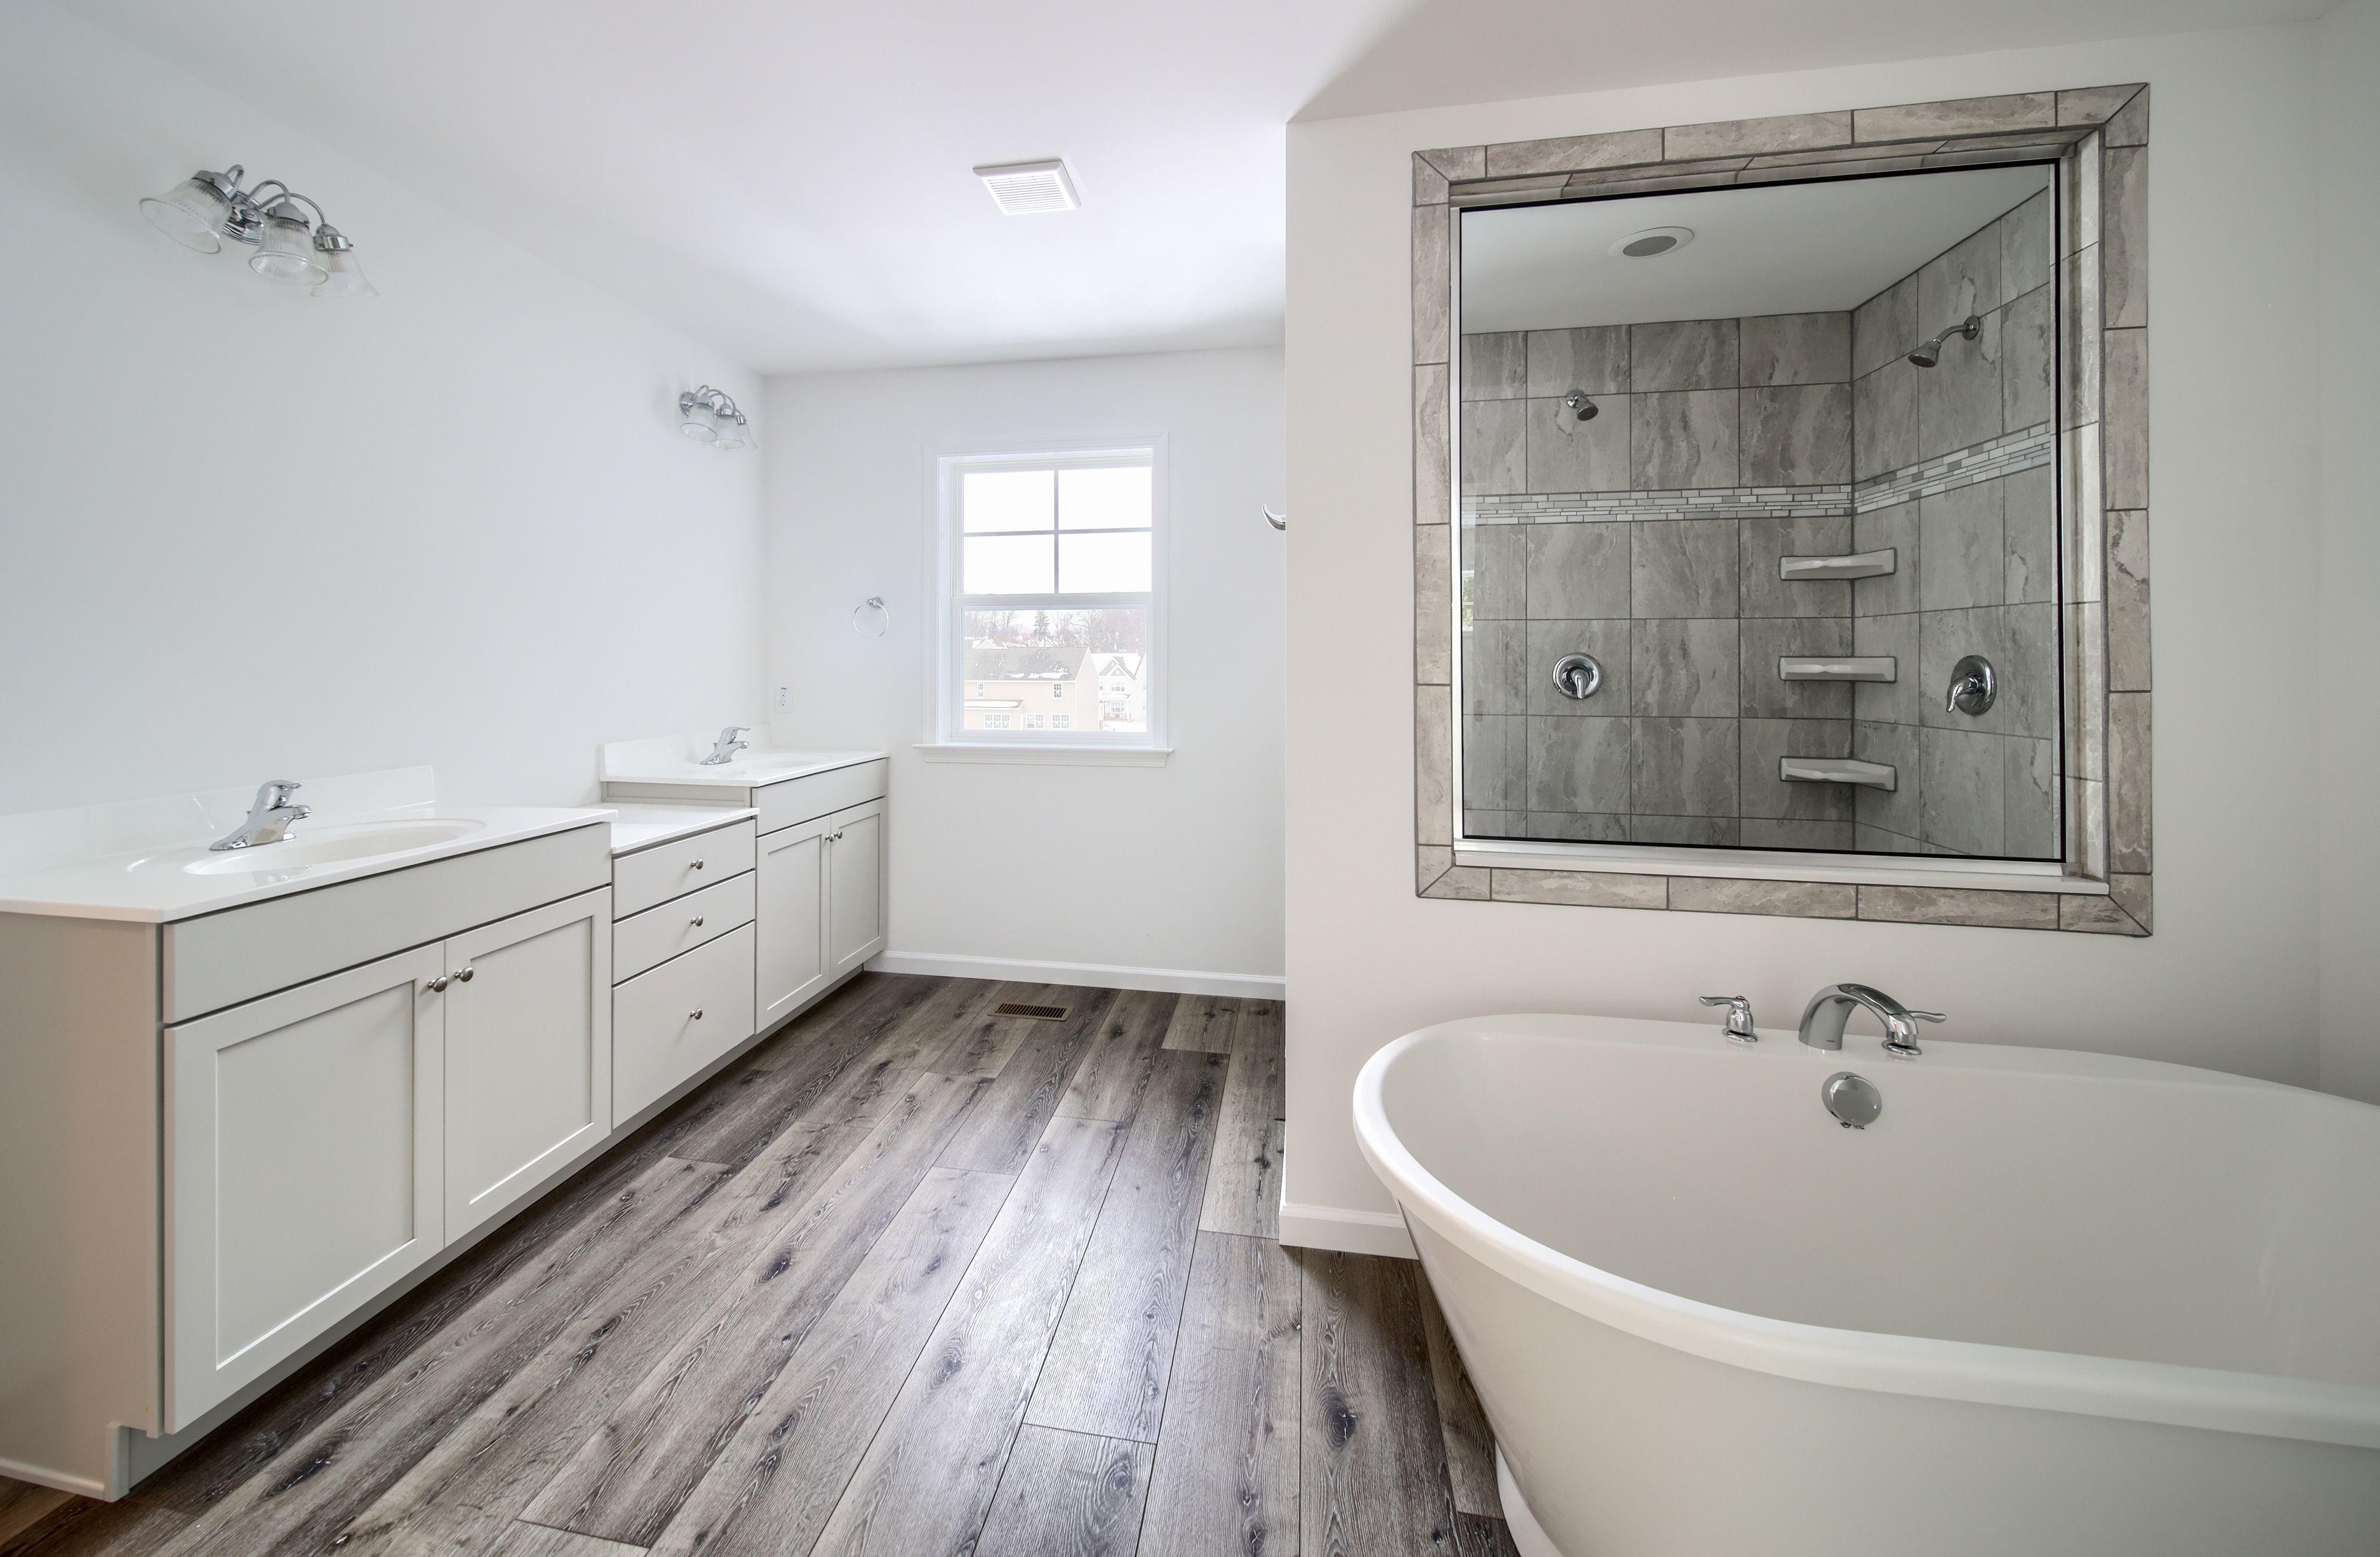 Bathroom featured in the Addison Farmhouse By Keystone Custom Homes in Wilmington-Newark, MD